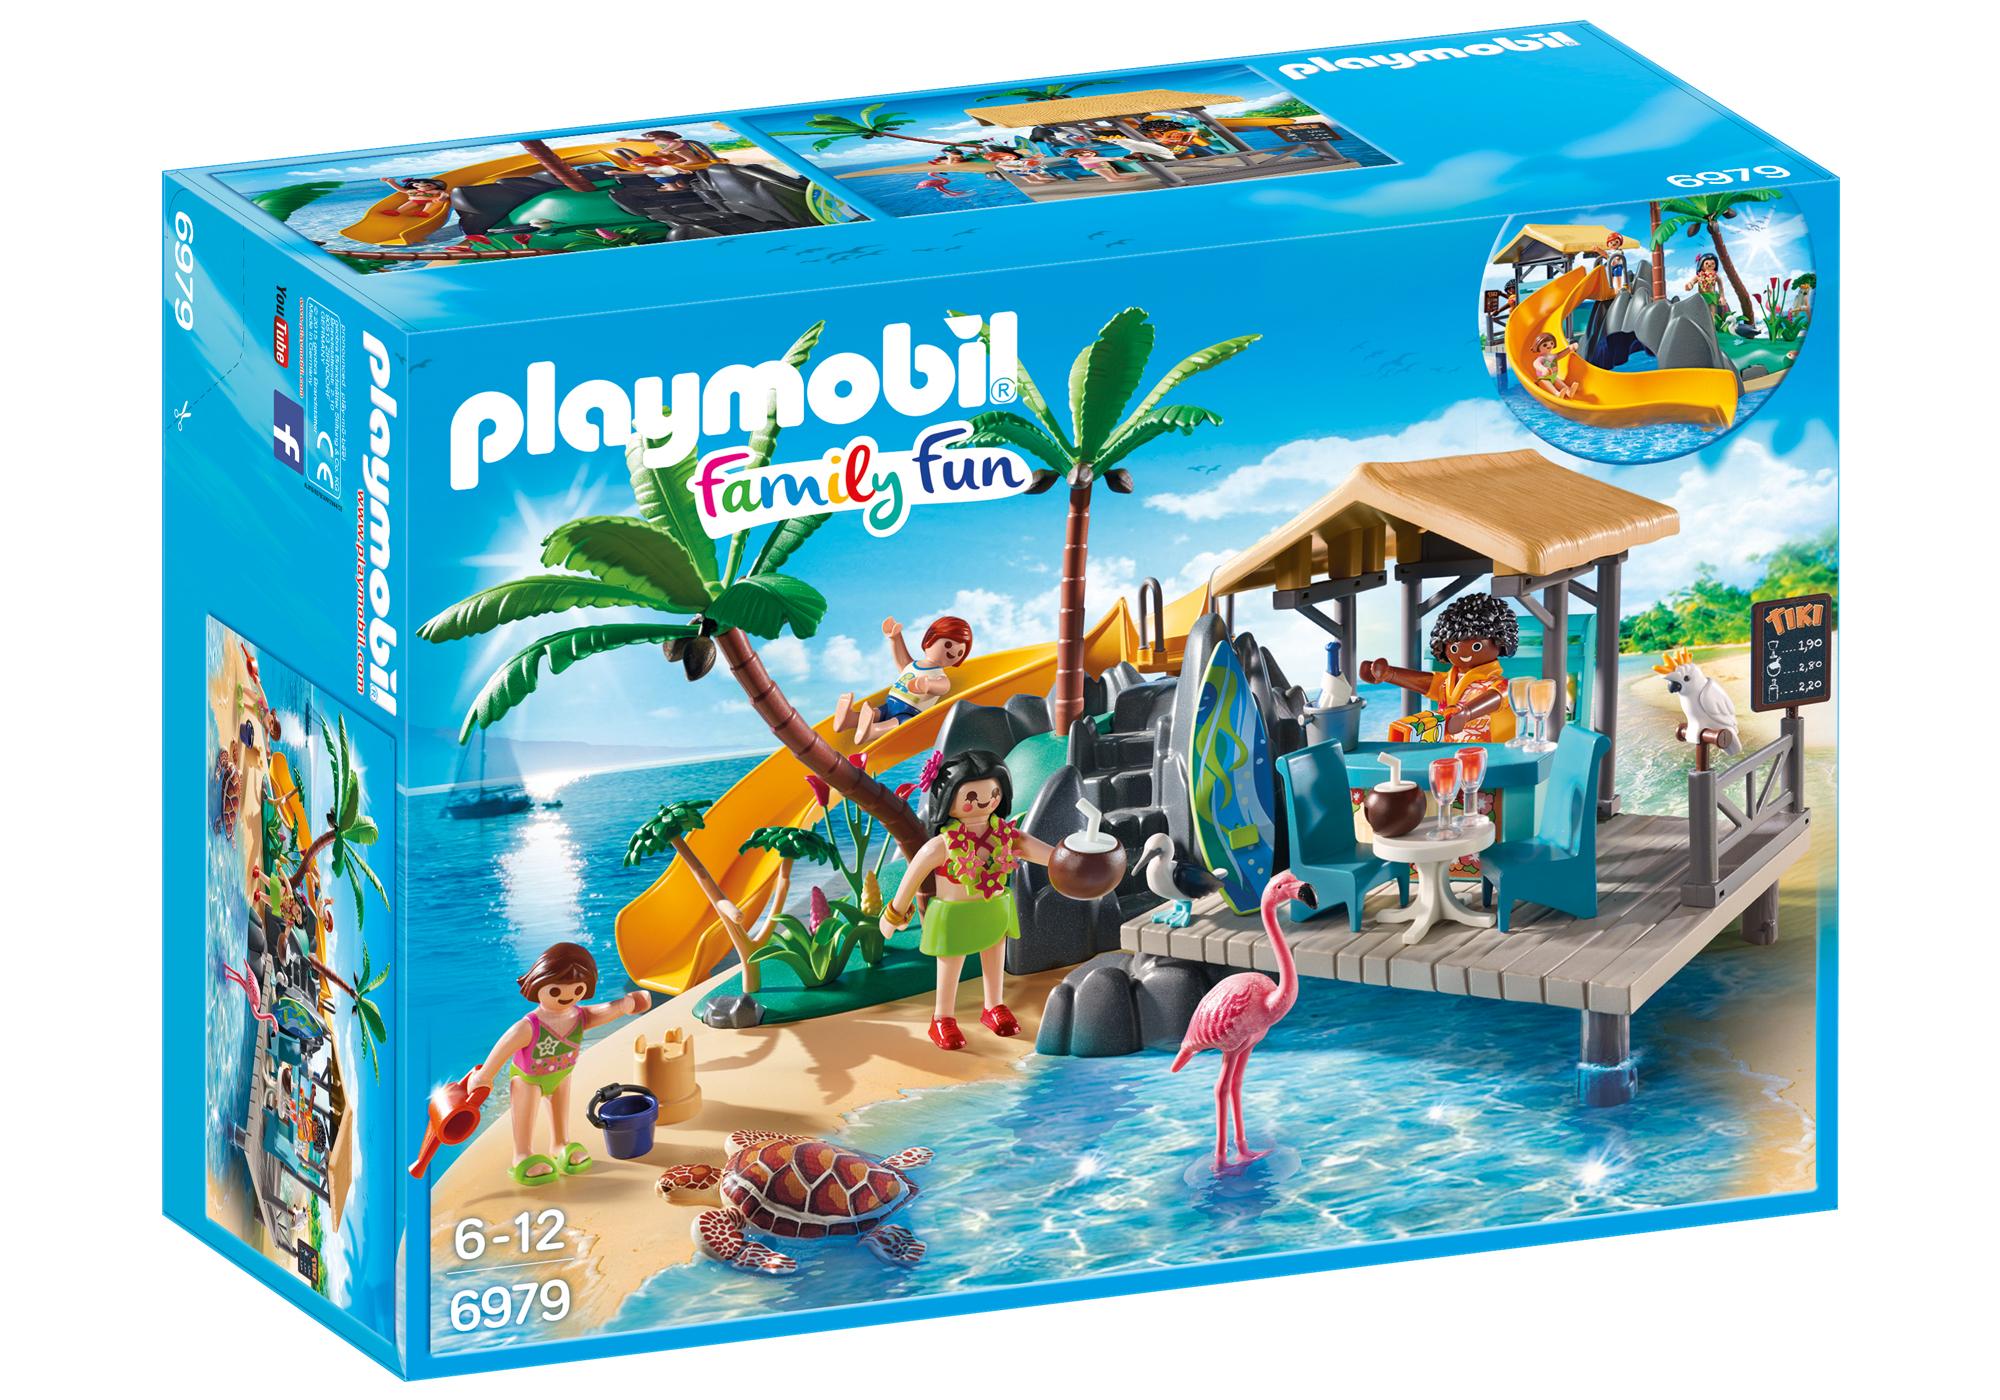 http://media.playmobil.com/i/playmobil/6979_product_box_front